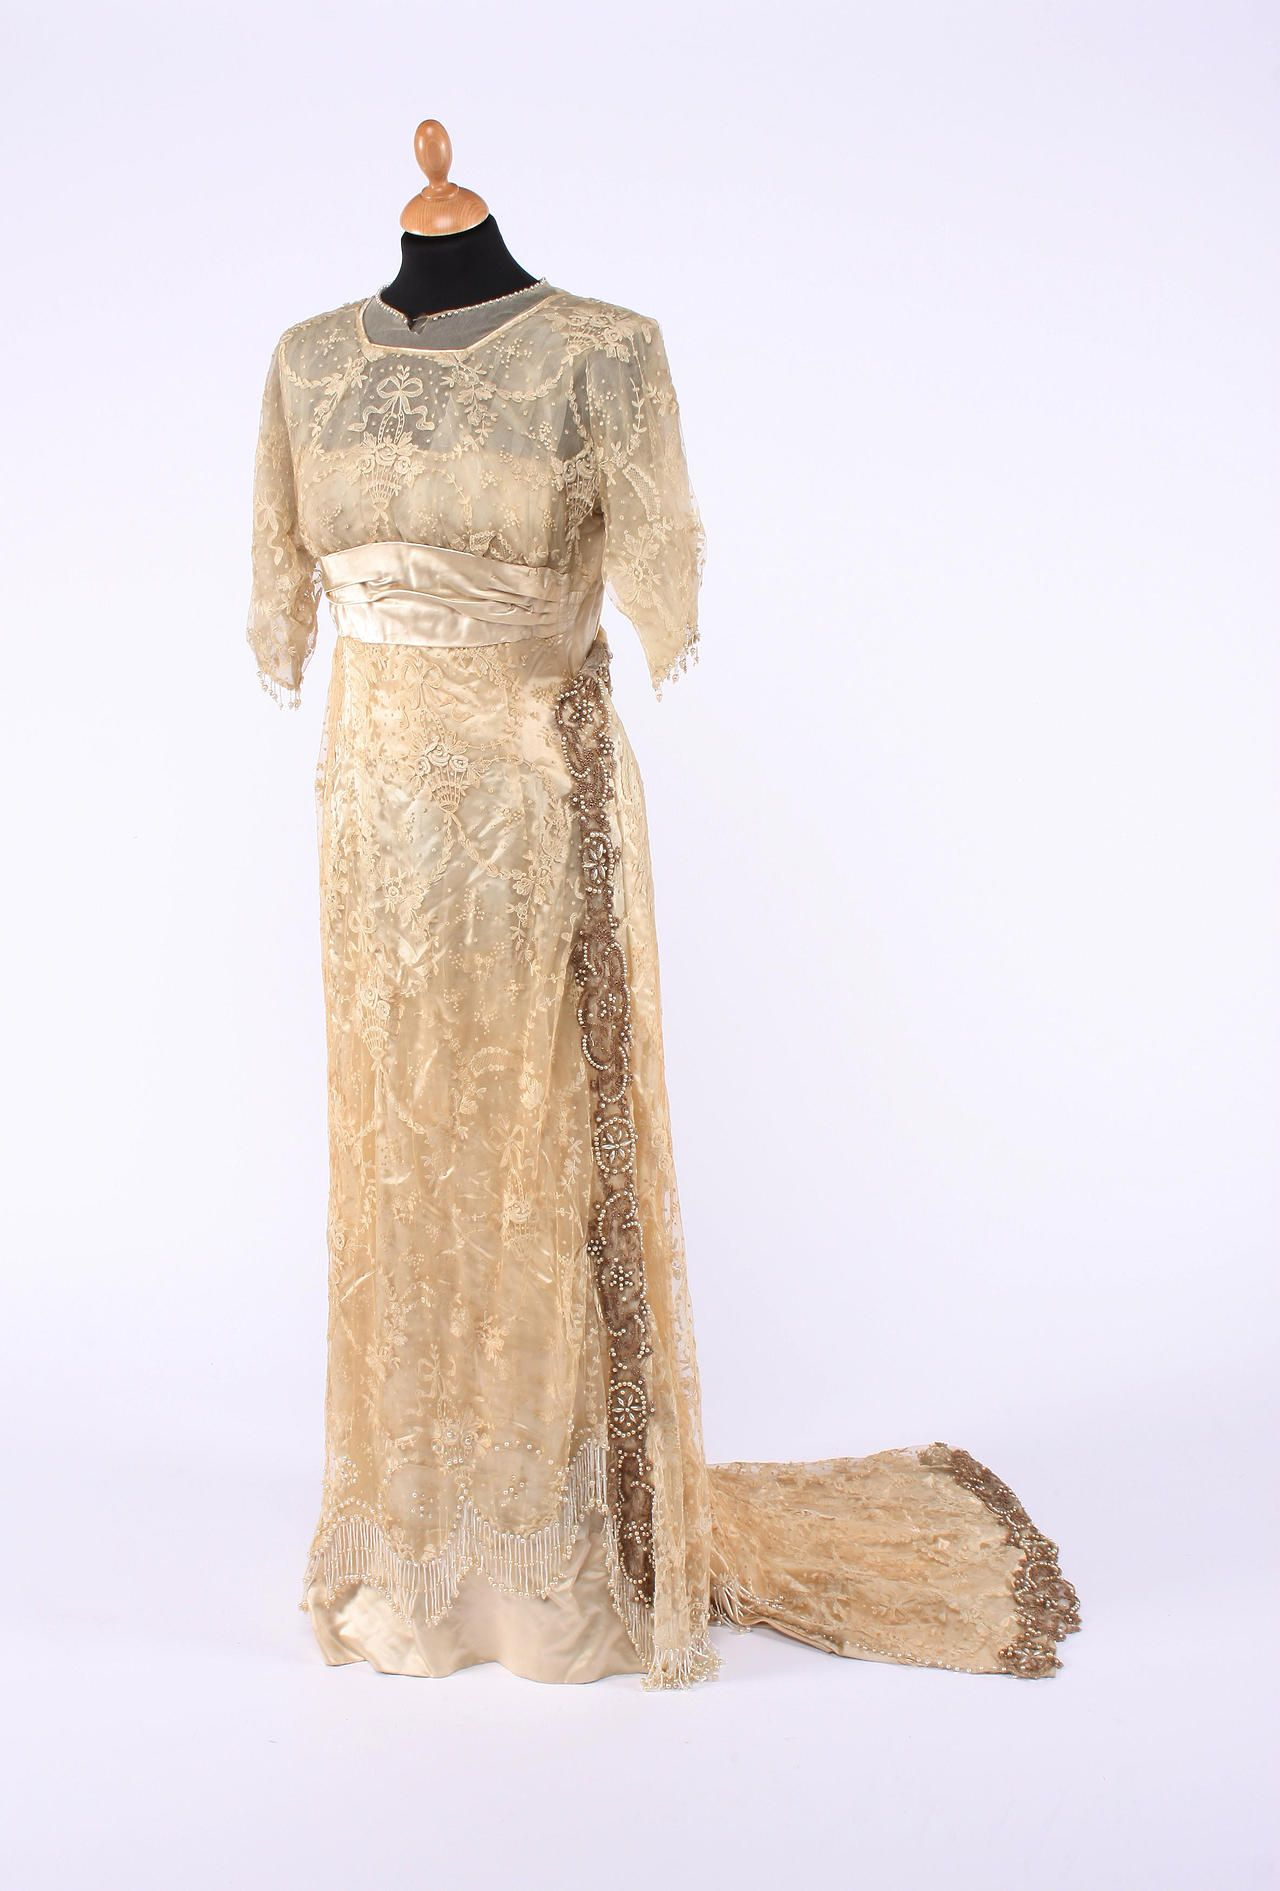 Tamboured lace and cream satin wedding dress 1910 high